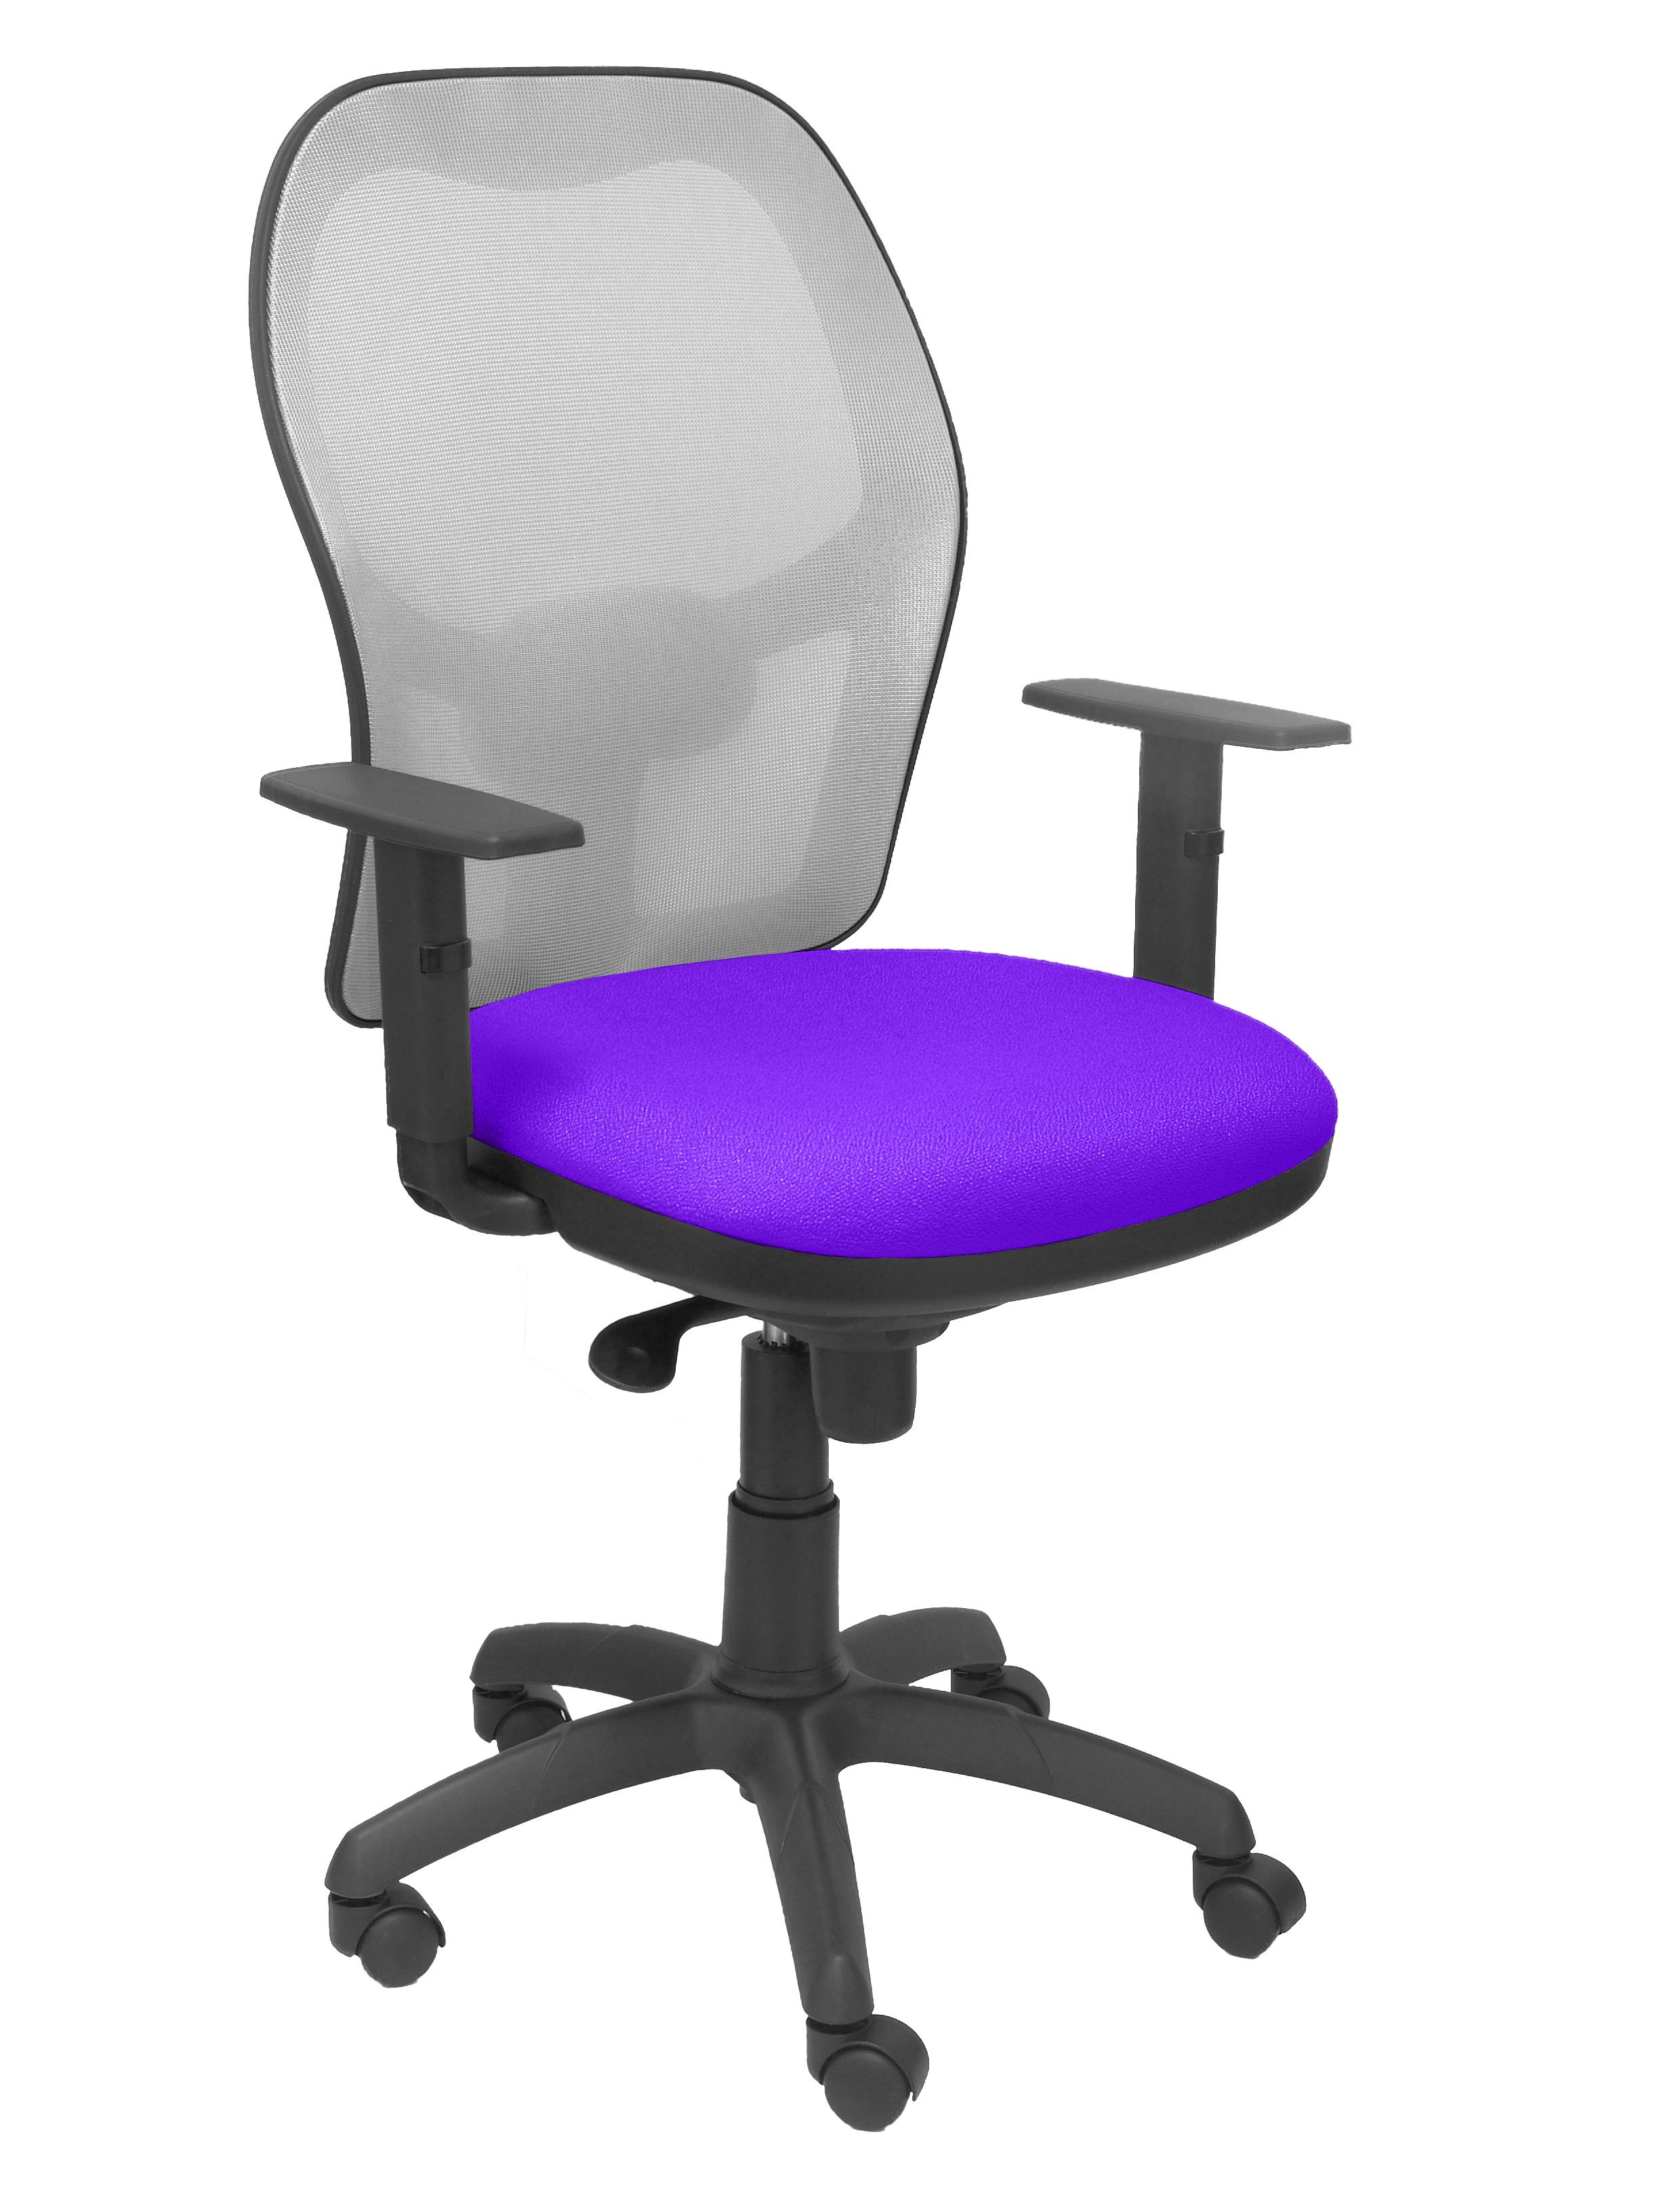 Silla Jorquera malla gris asiento bali lila